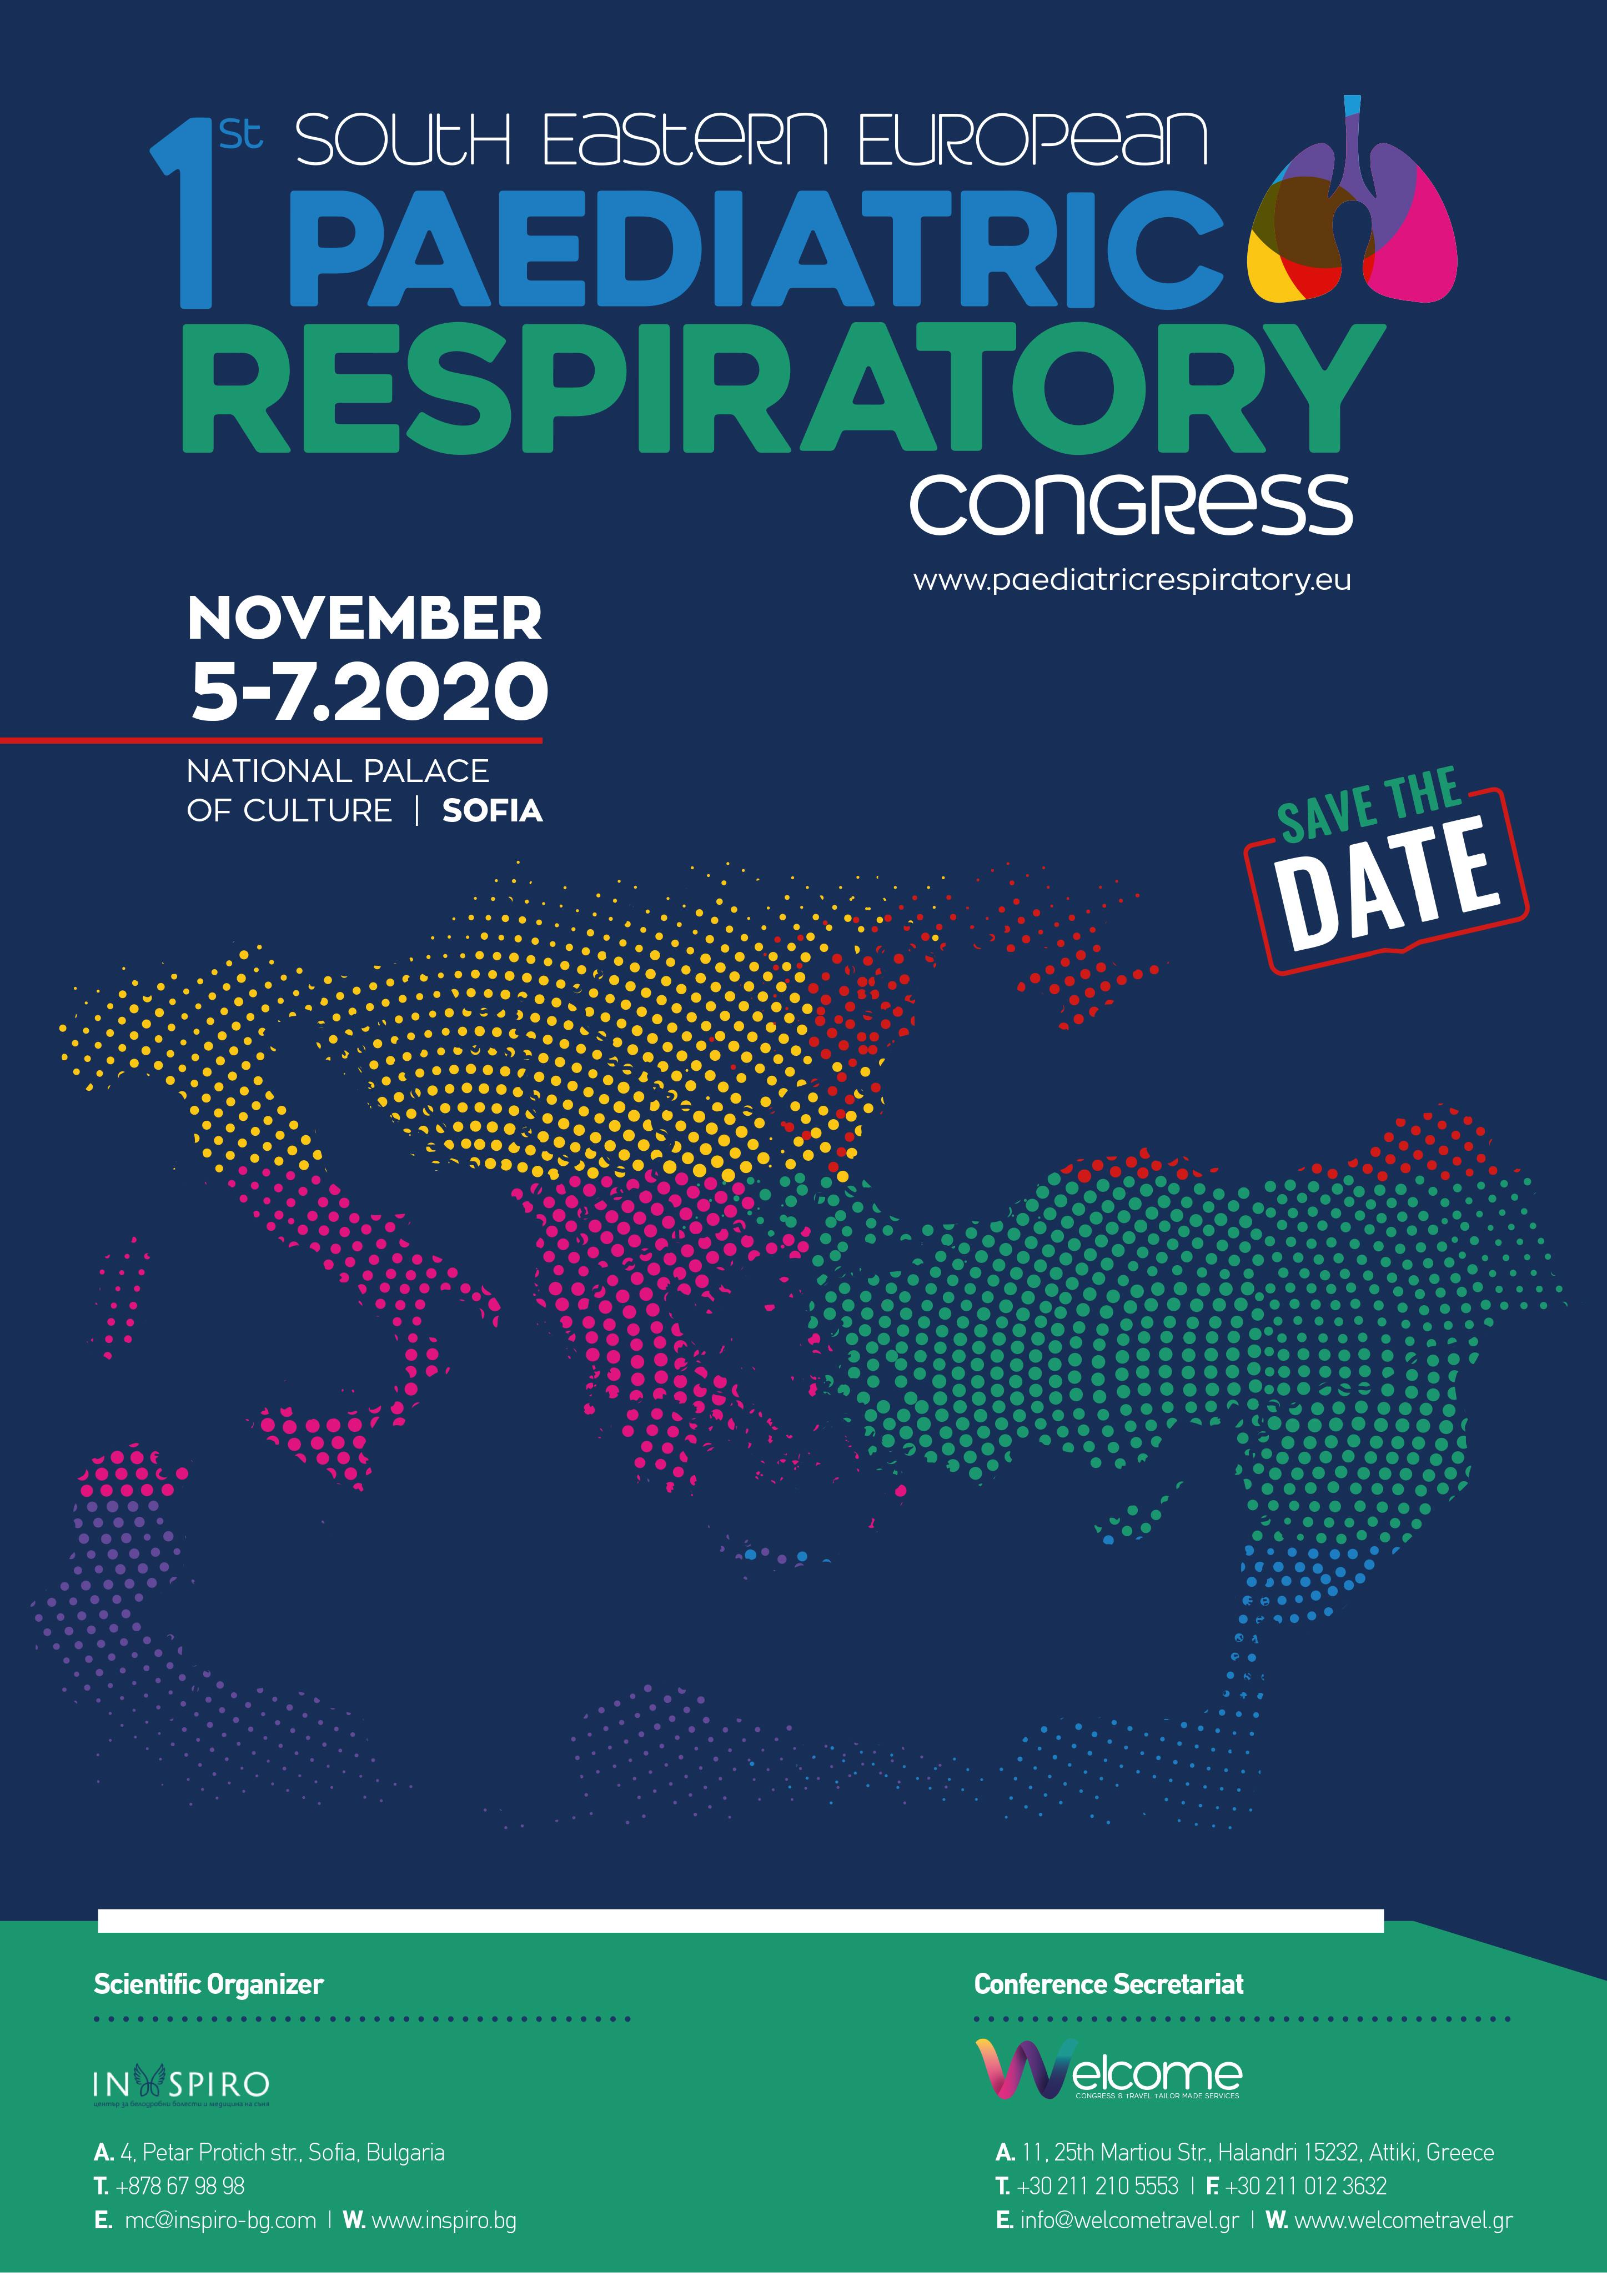 1st South Eastern European Paediatric Respiratory Congress